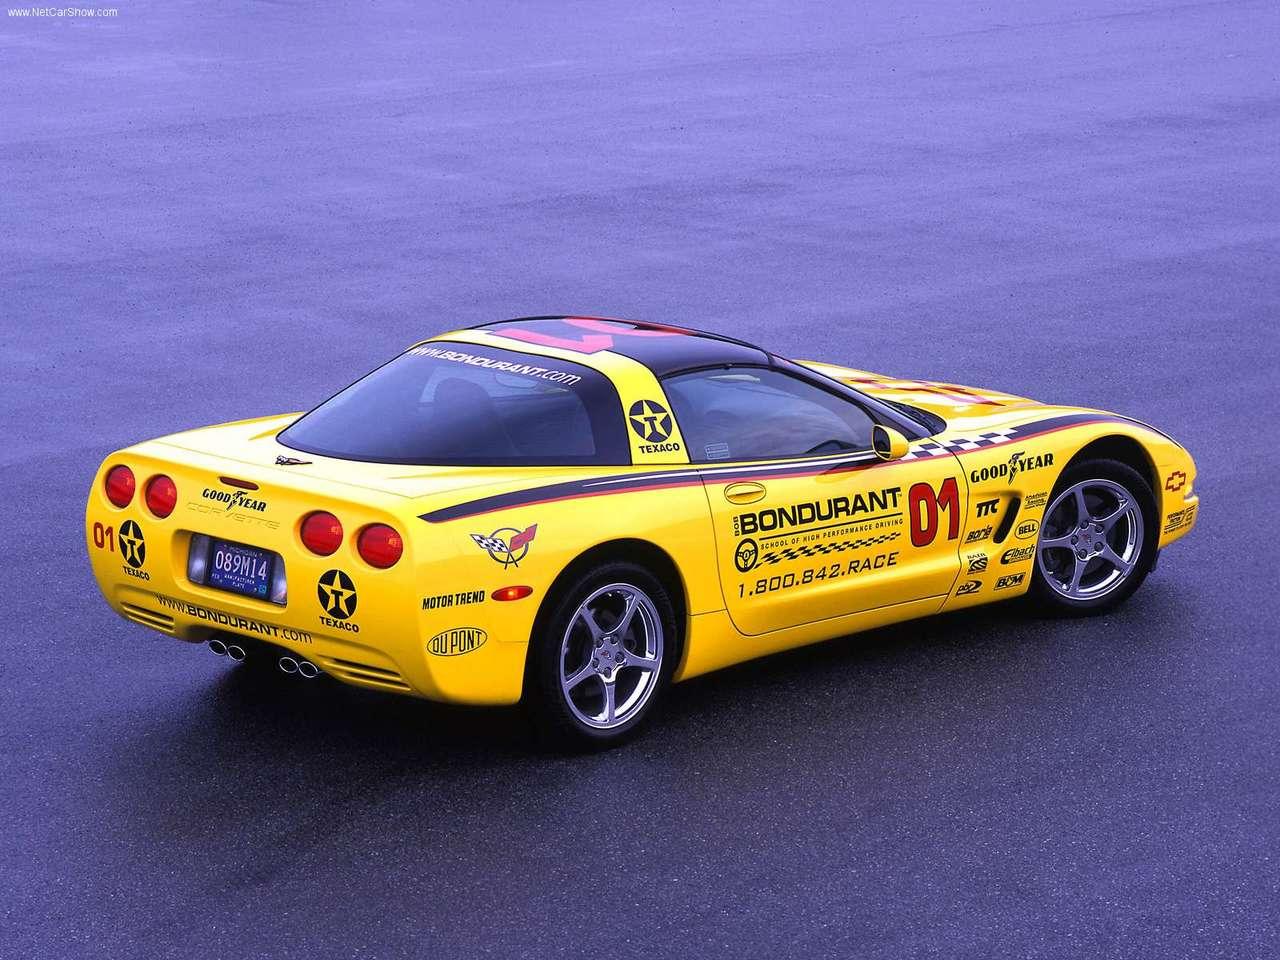 http://1.bp.blogspot.com/-ysZSmmlLnNg/TYZw3oNSNdI/AAAAAAAAN48/YpCP-5VkRCo/s1600/Chevrolet-Corvette_Bondurant_2003_1280x960_wallpaper_04.jpg